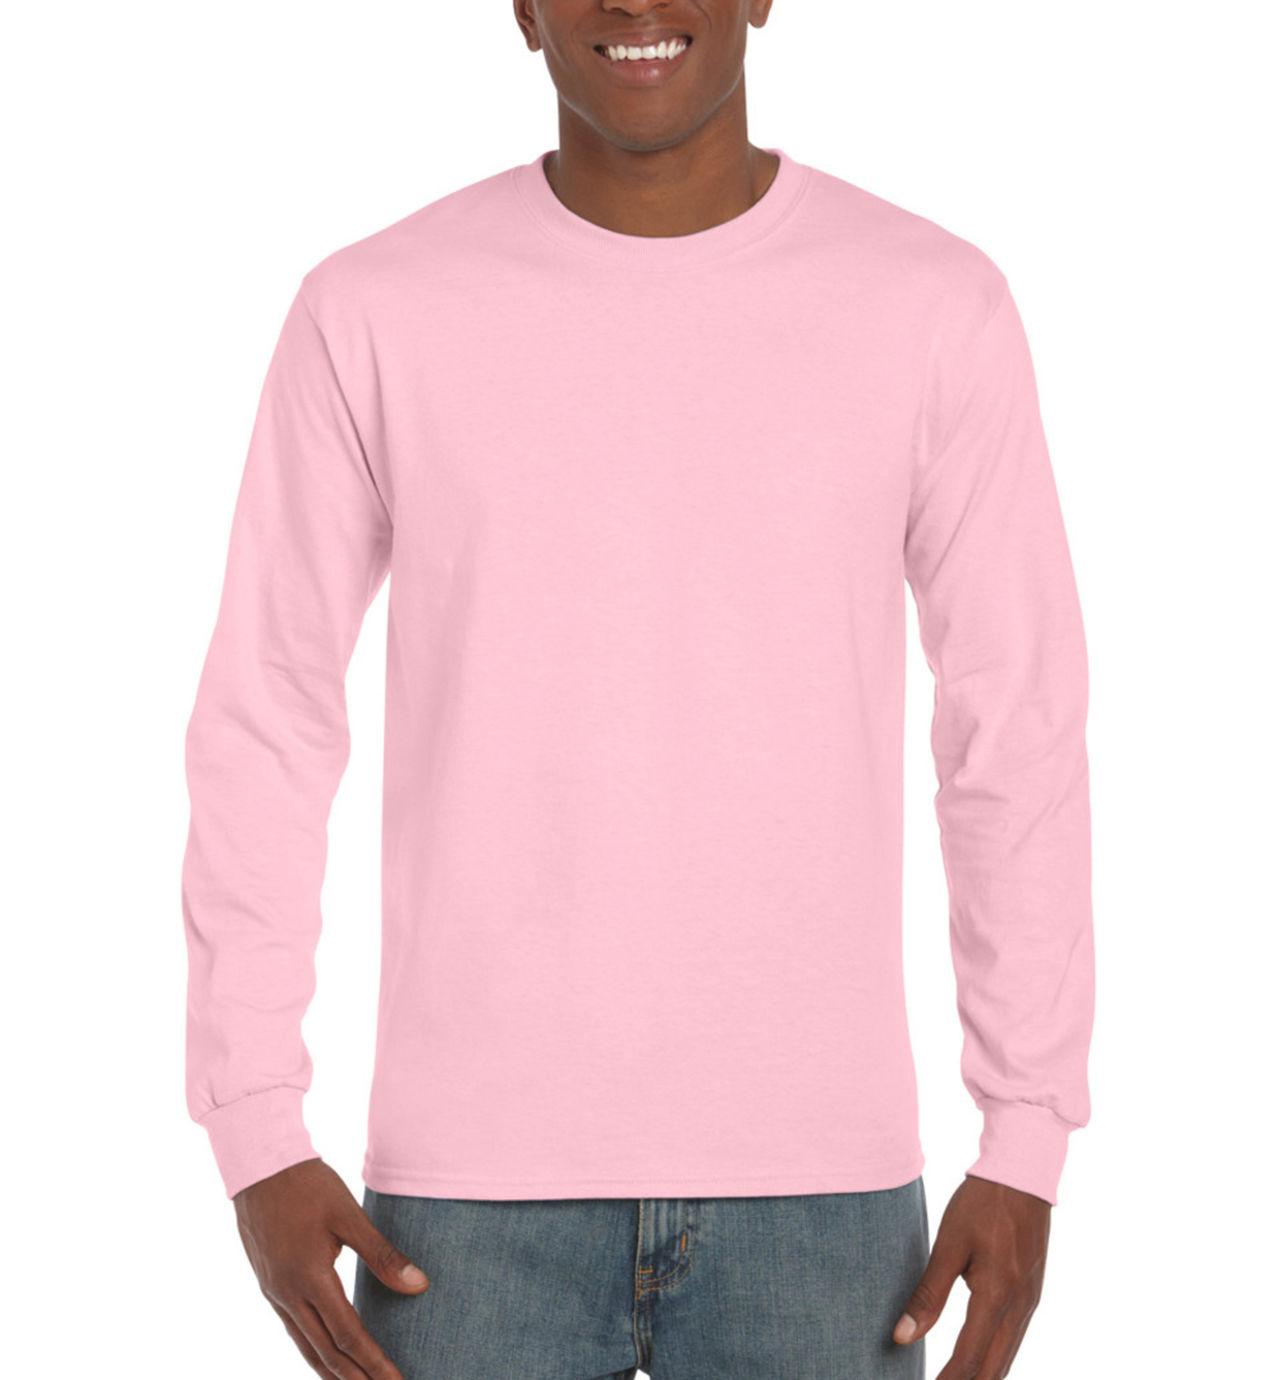 Pink long sleeve t shirt mens south park t shirts for Mens pink long sleeve shirt